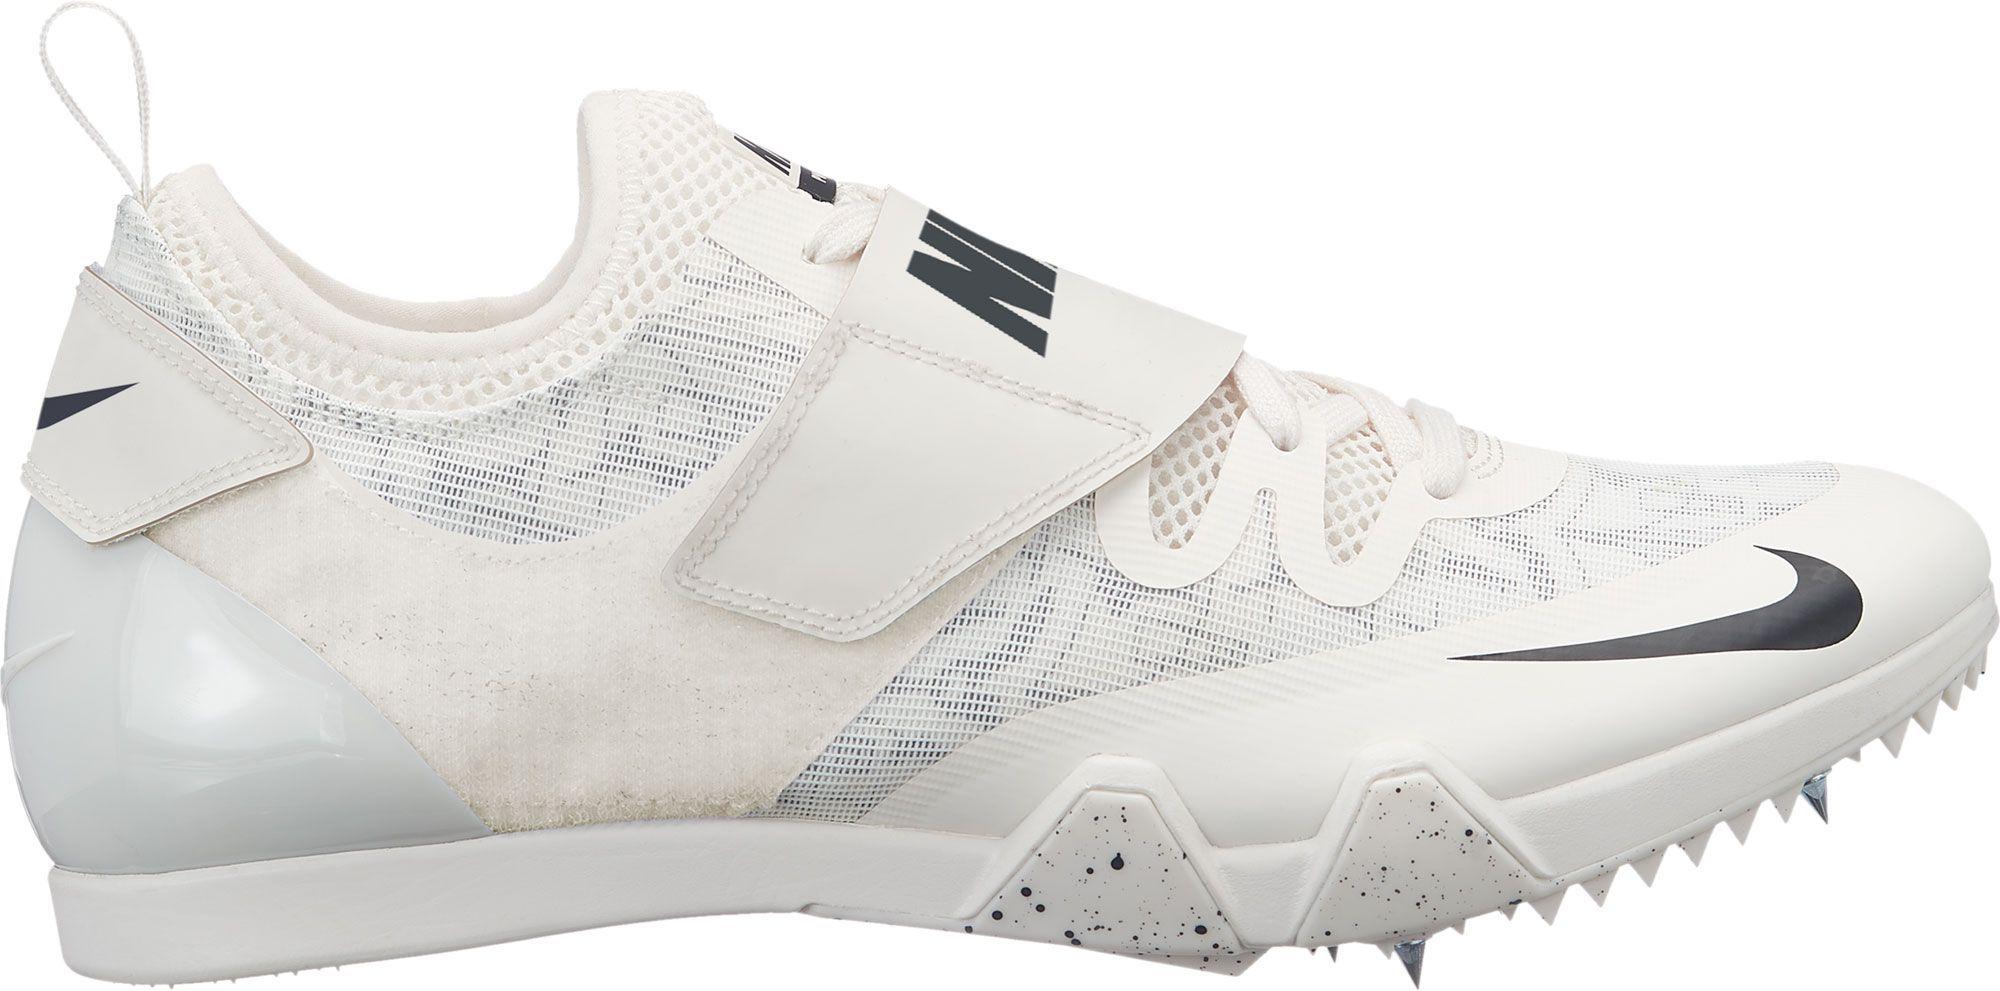 Nike Pole Vault Track & Field Shoes